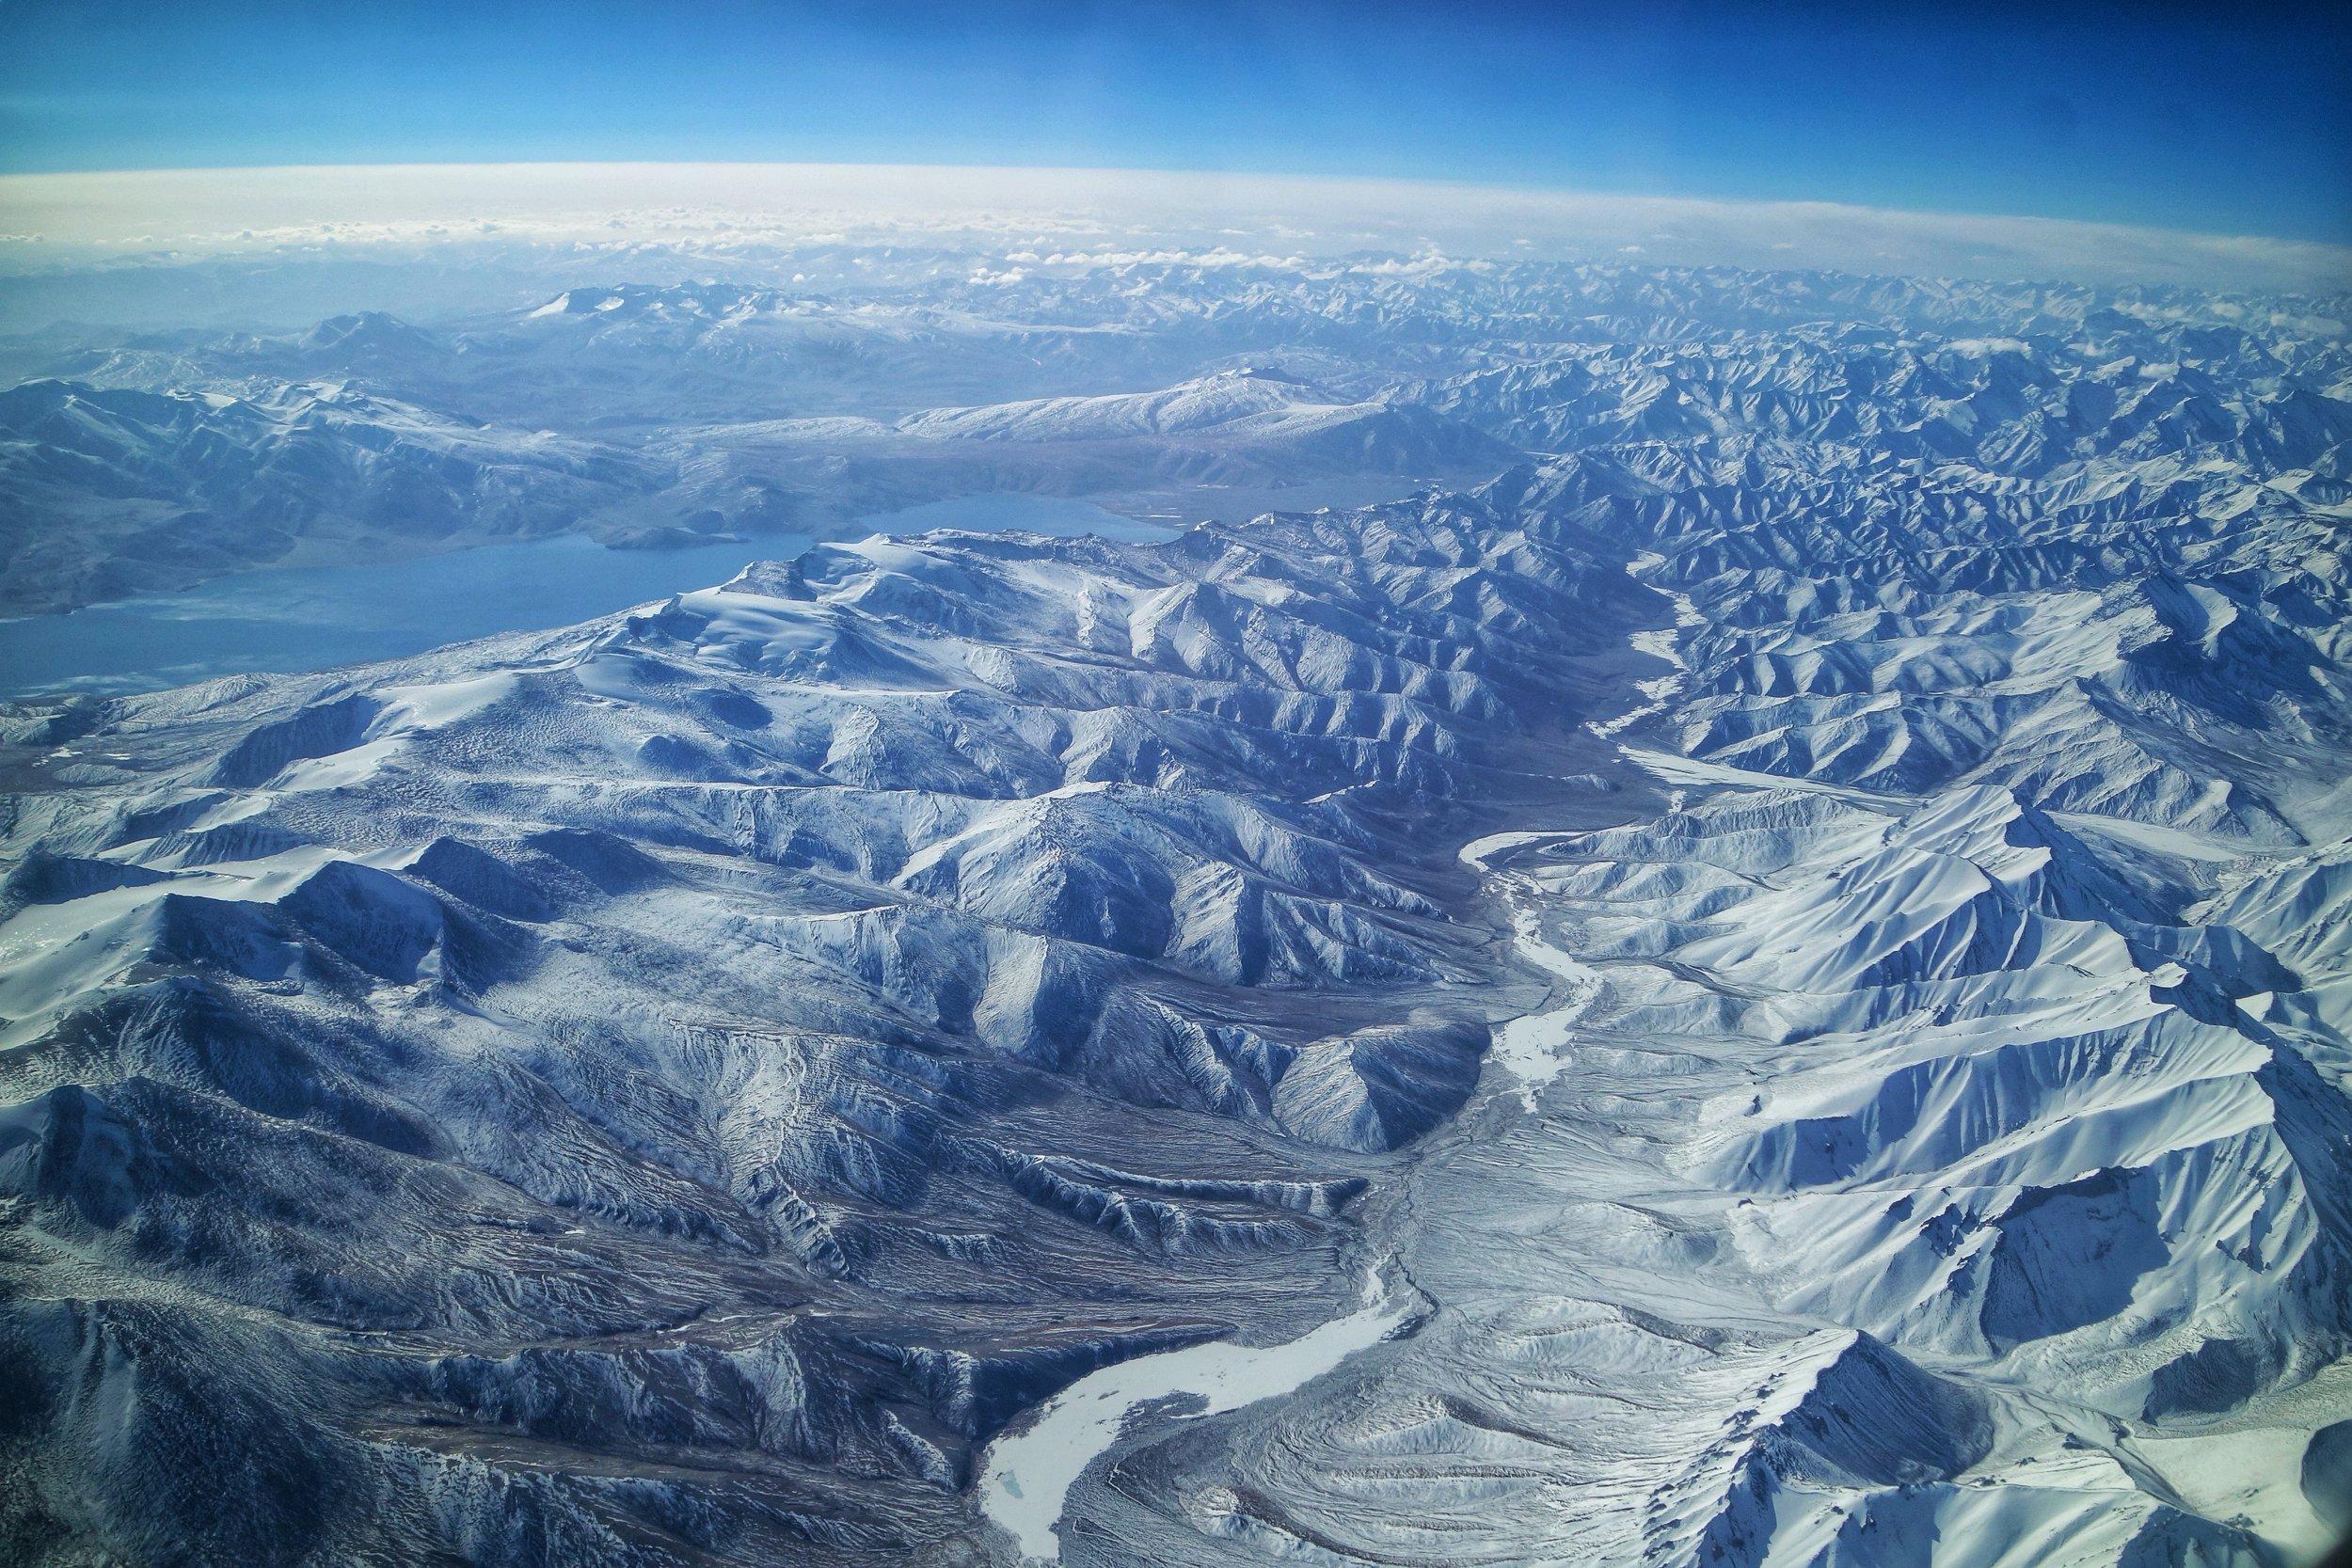 The Lakes of the Trans Himalayas : The Tso Moriri